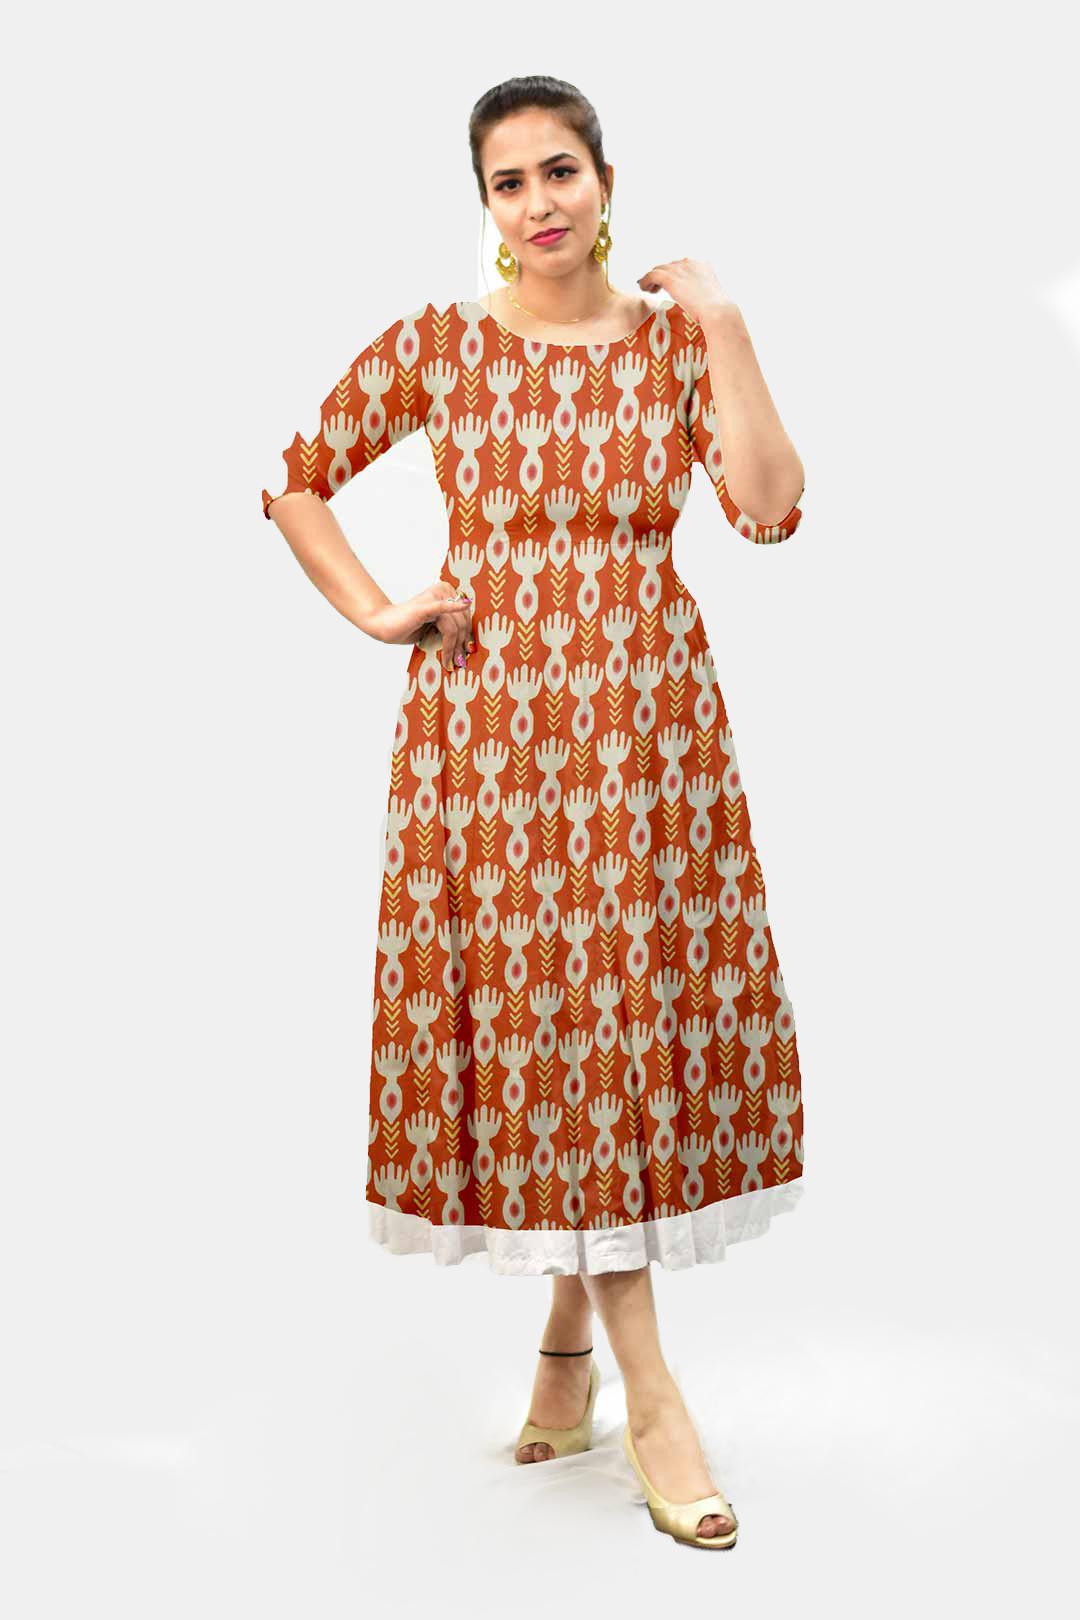 Cotton A Line Dress – Bind (Brick Red)